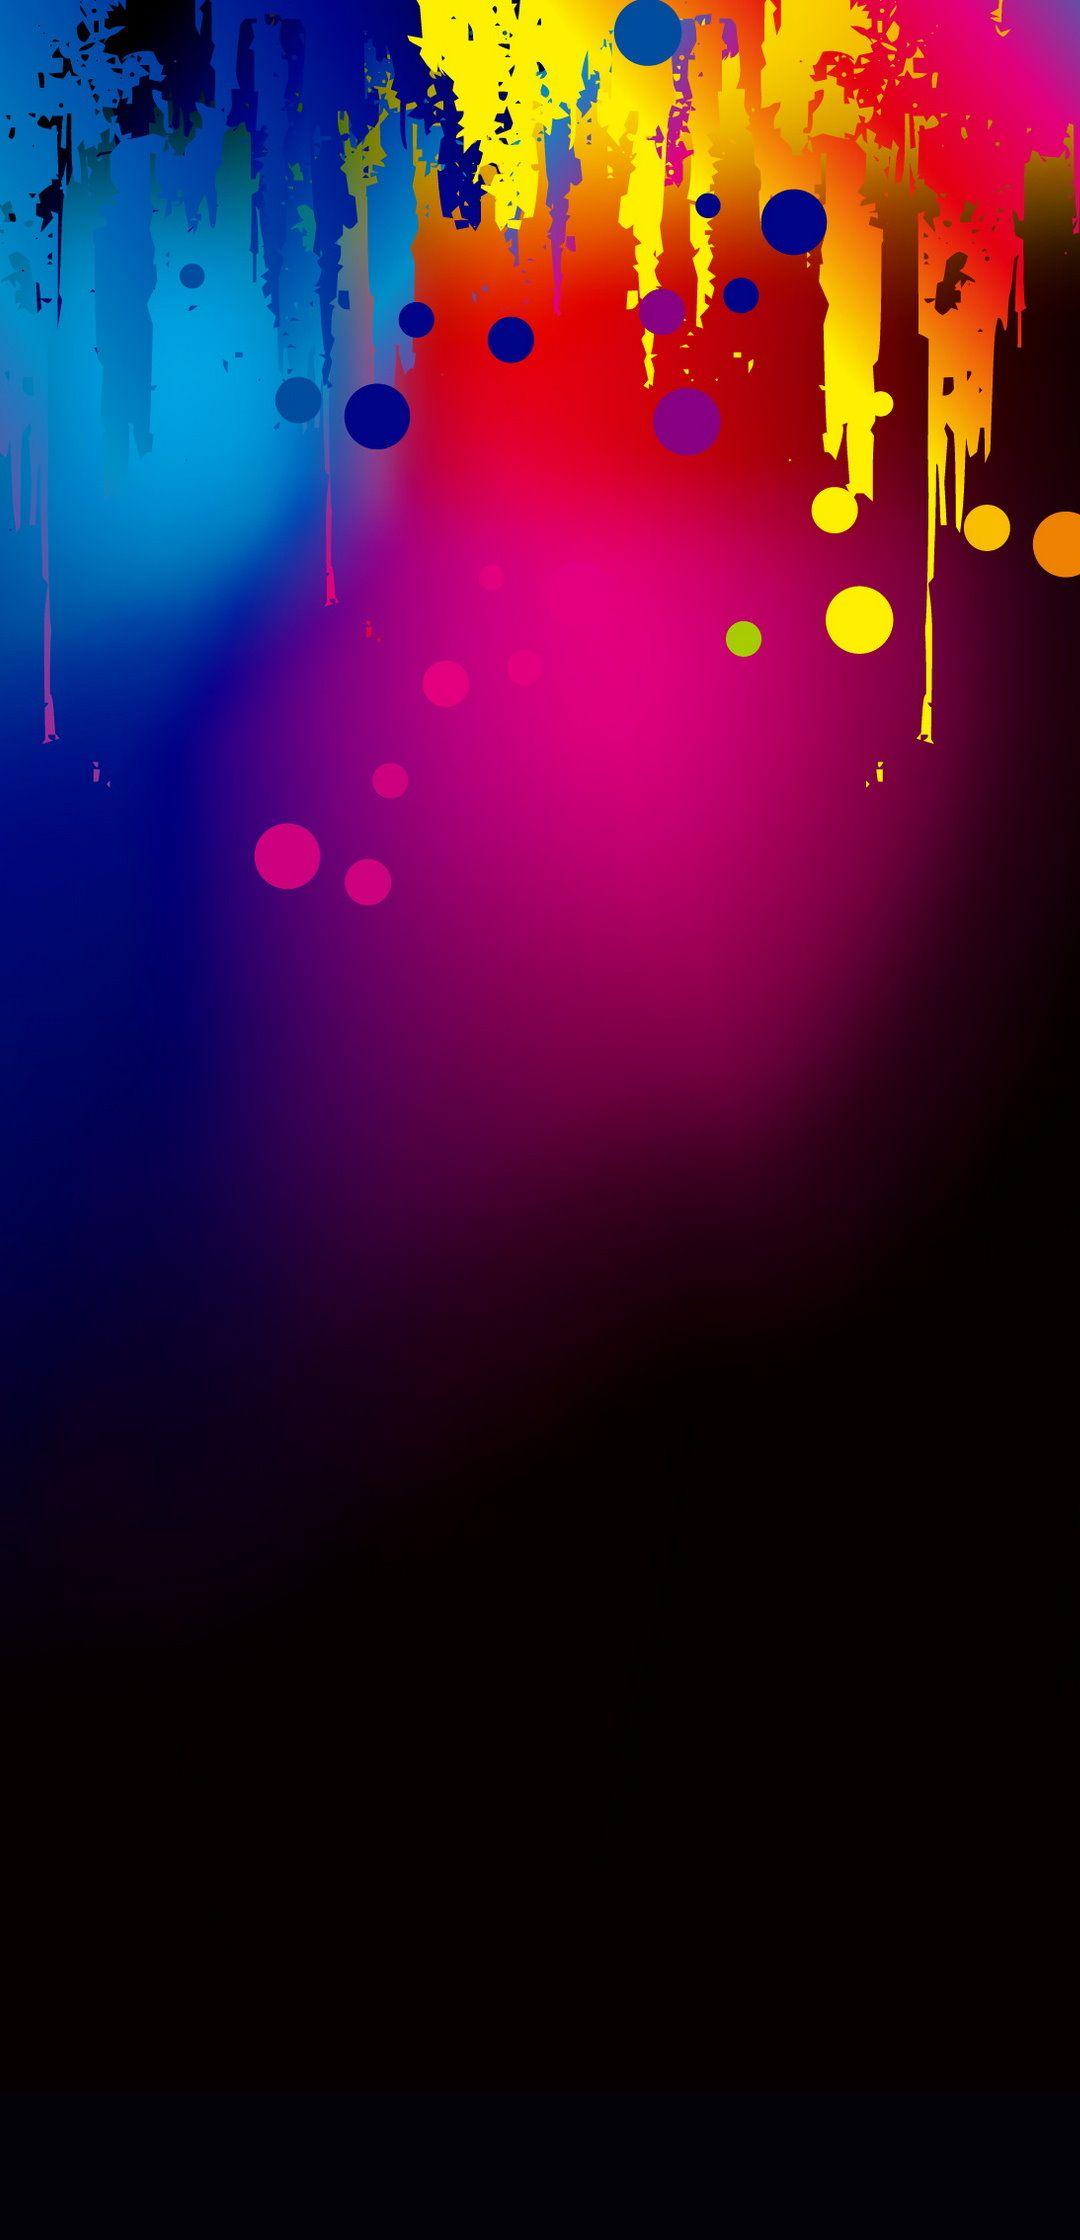 Wallpapers Huawei P20 Pro | Fondos en 2019 | Pinterest | Pantalla, Fondos de Pantalla y Pinturas